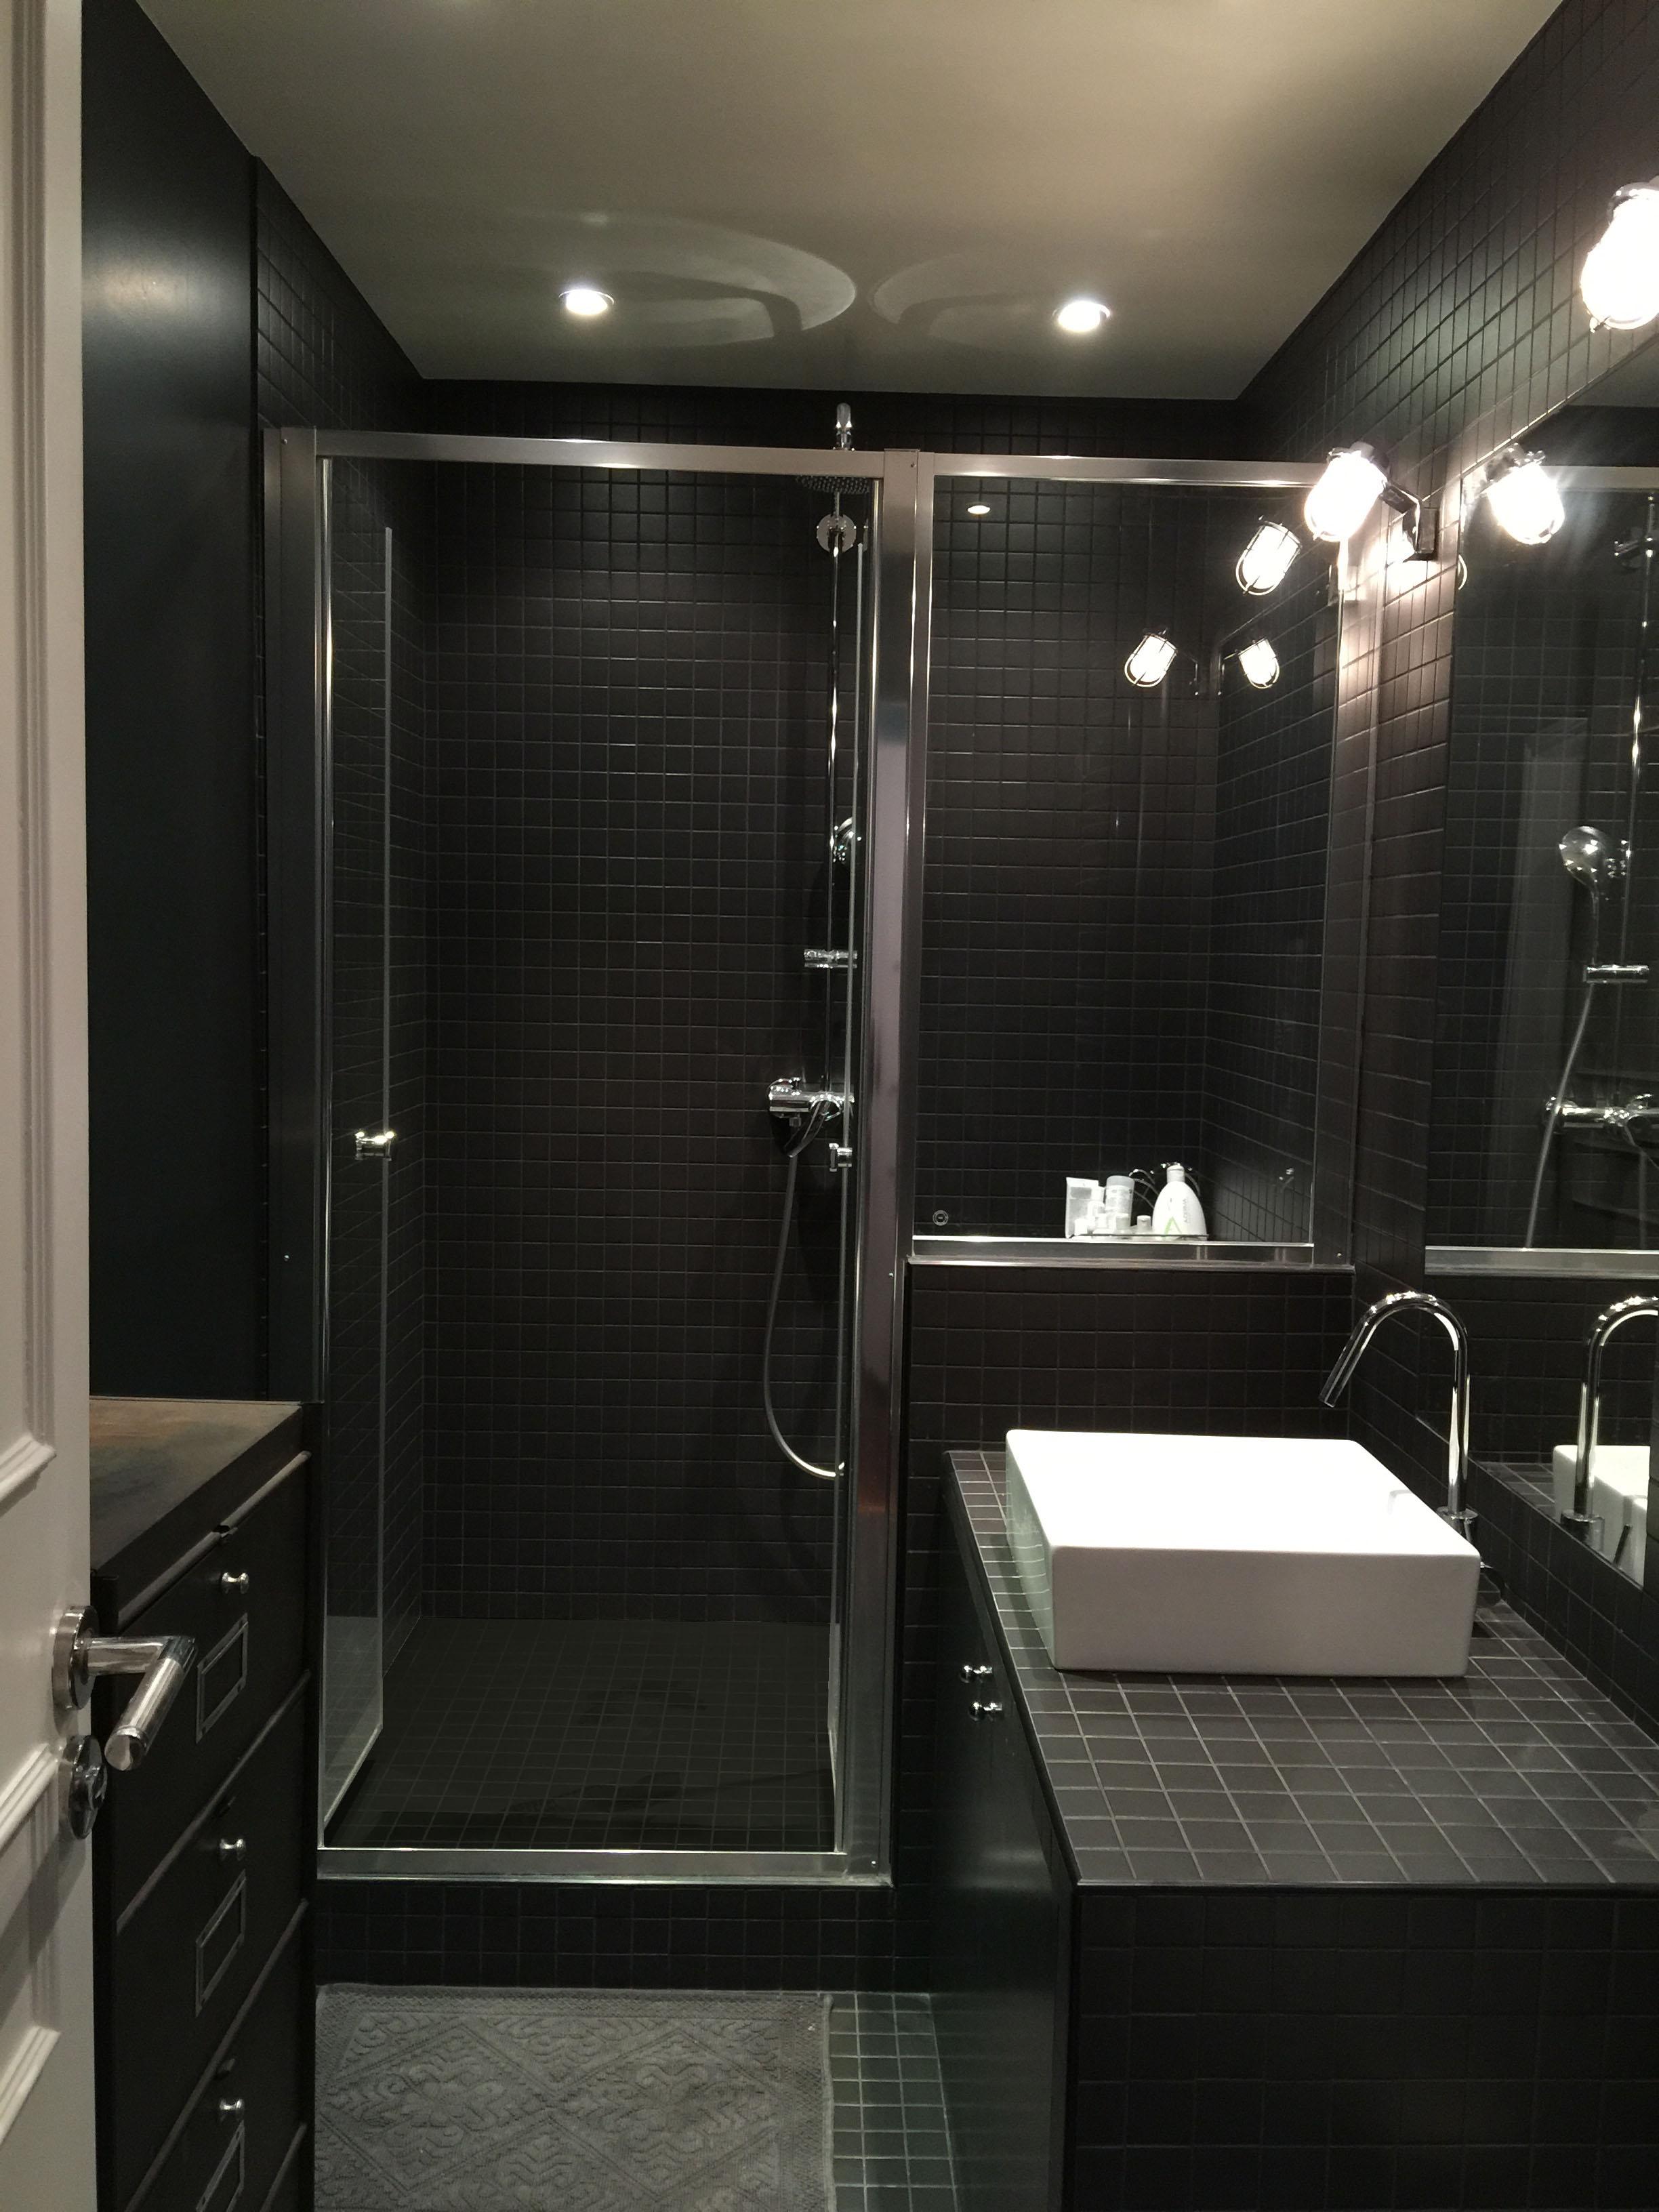 Joint salle de bain noir home design architecture for Joint de salle de bain noir